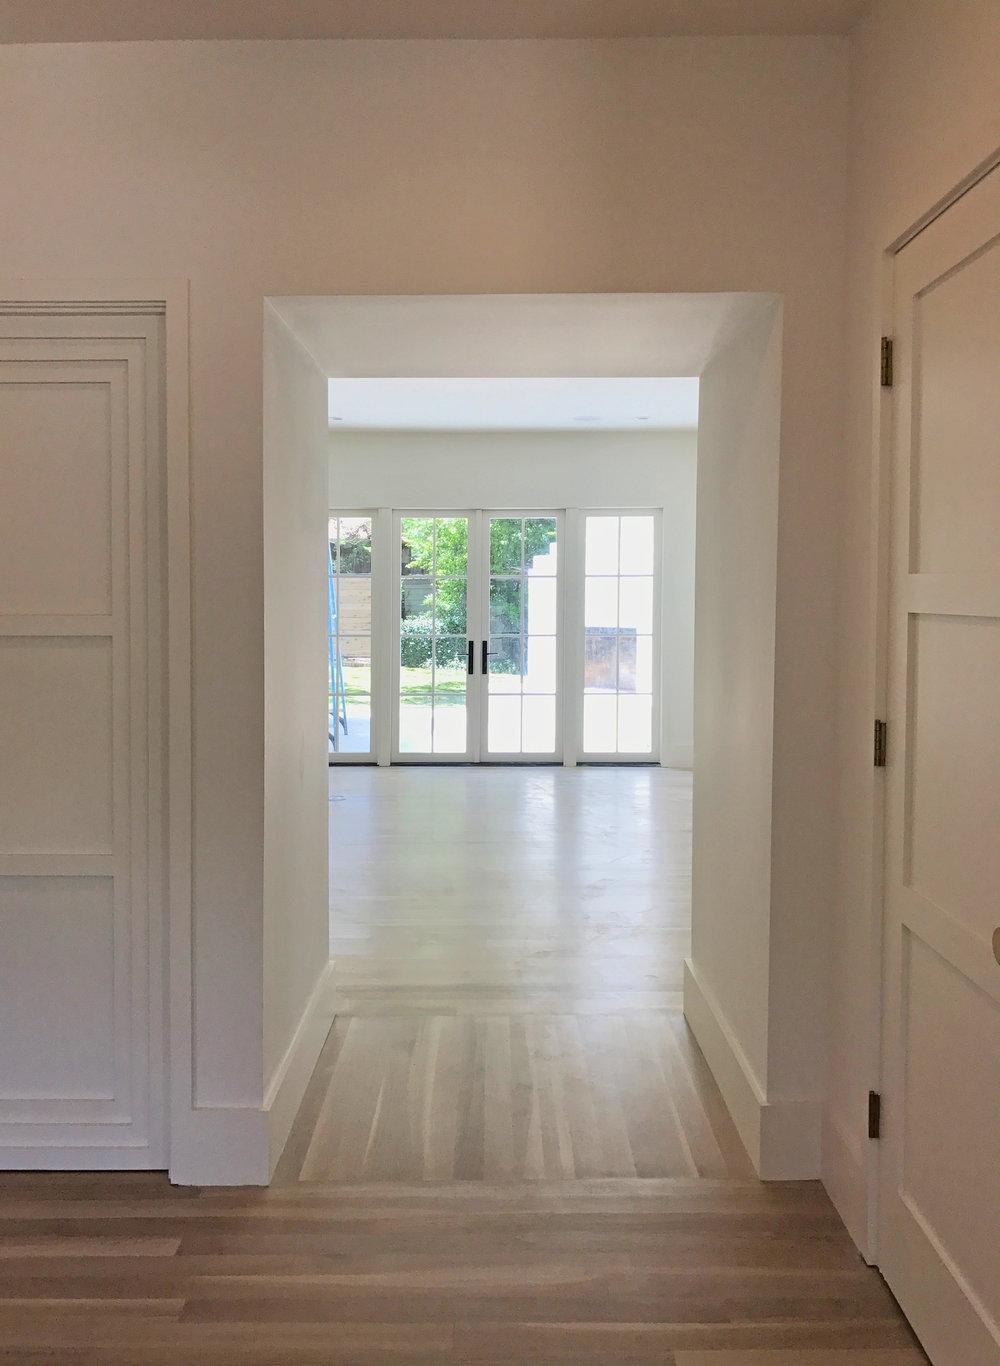 Elizabeth-Baird-Architecture-Southill Circle-hallway.jpg